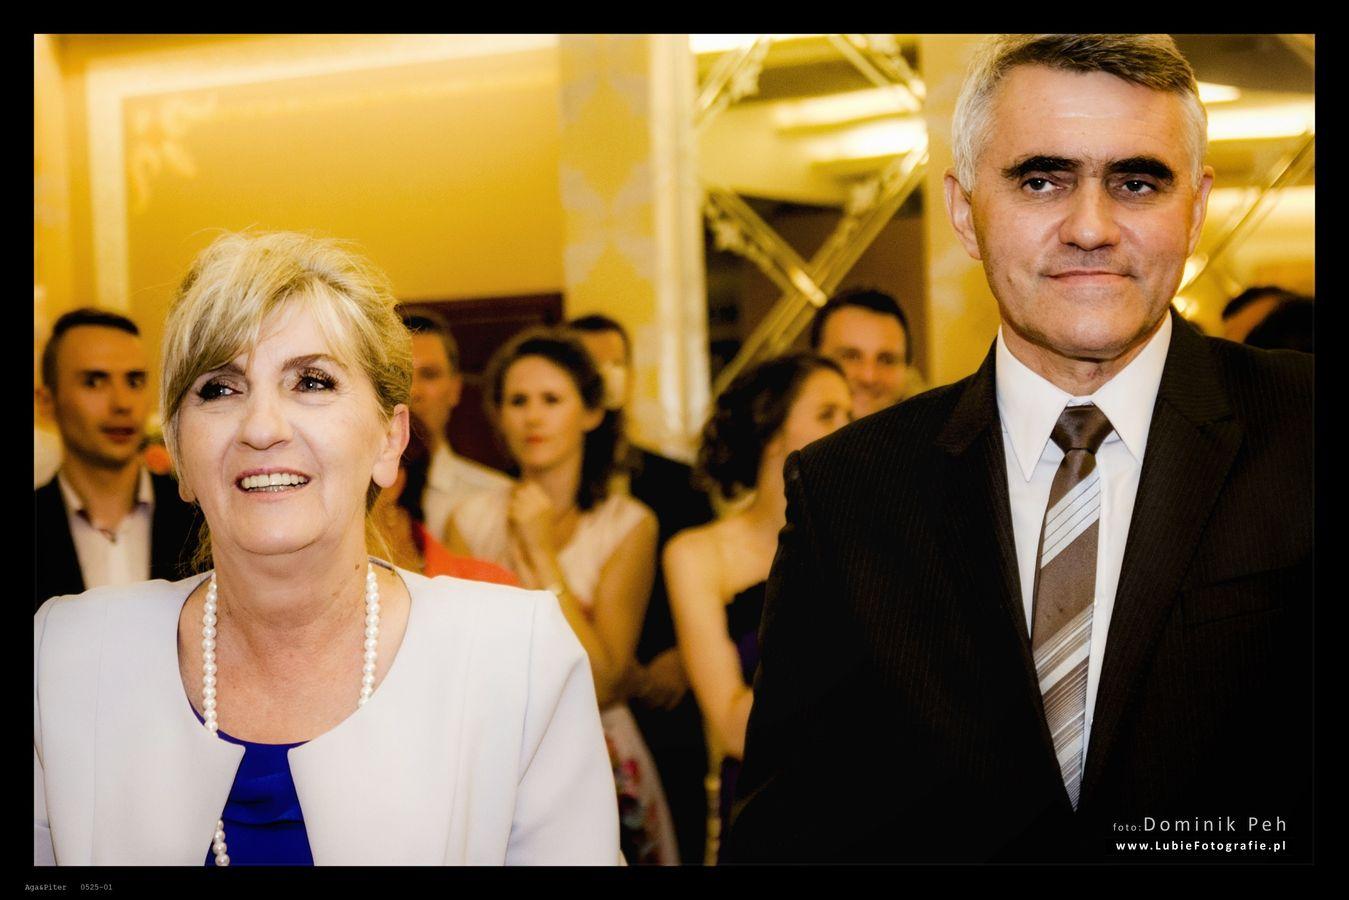 Agnieszka&Piotr  0054